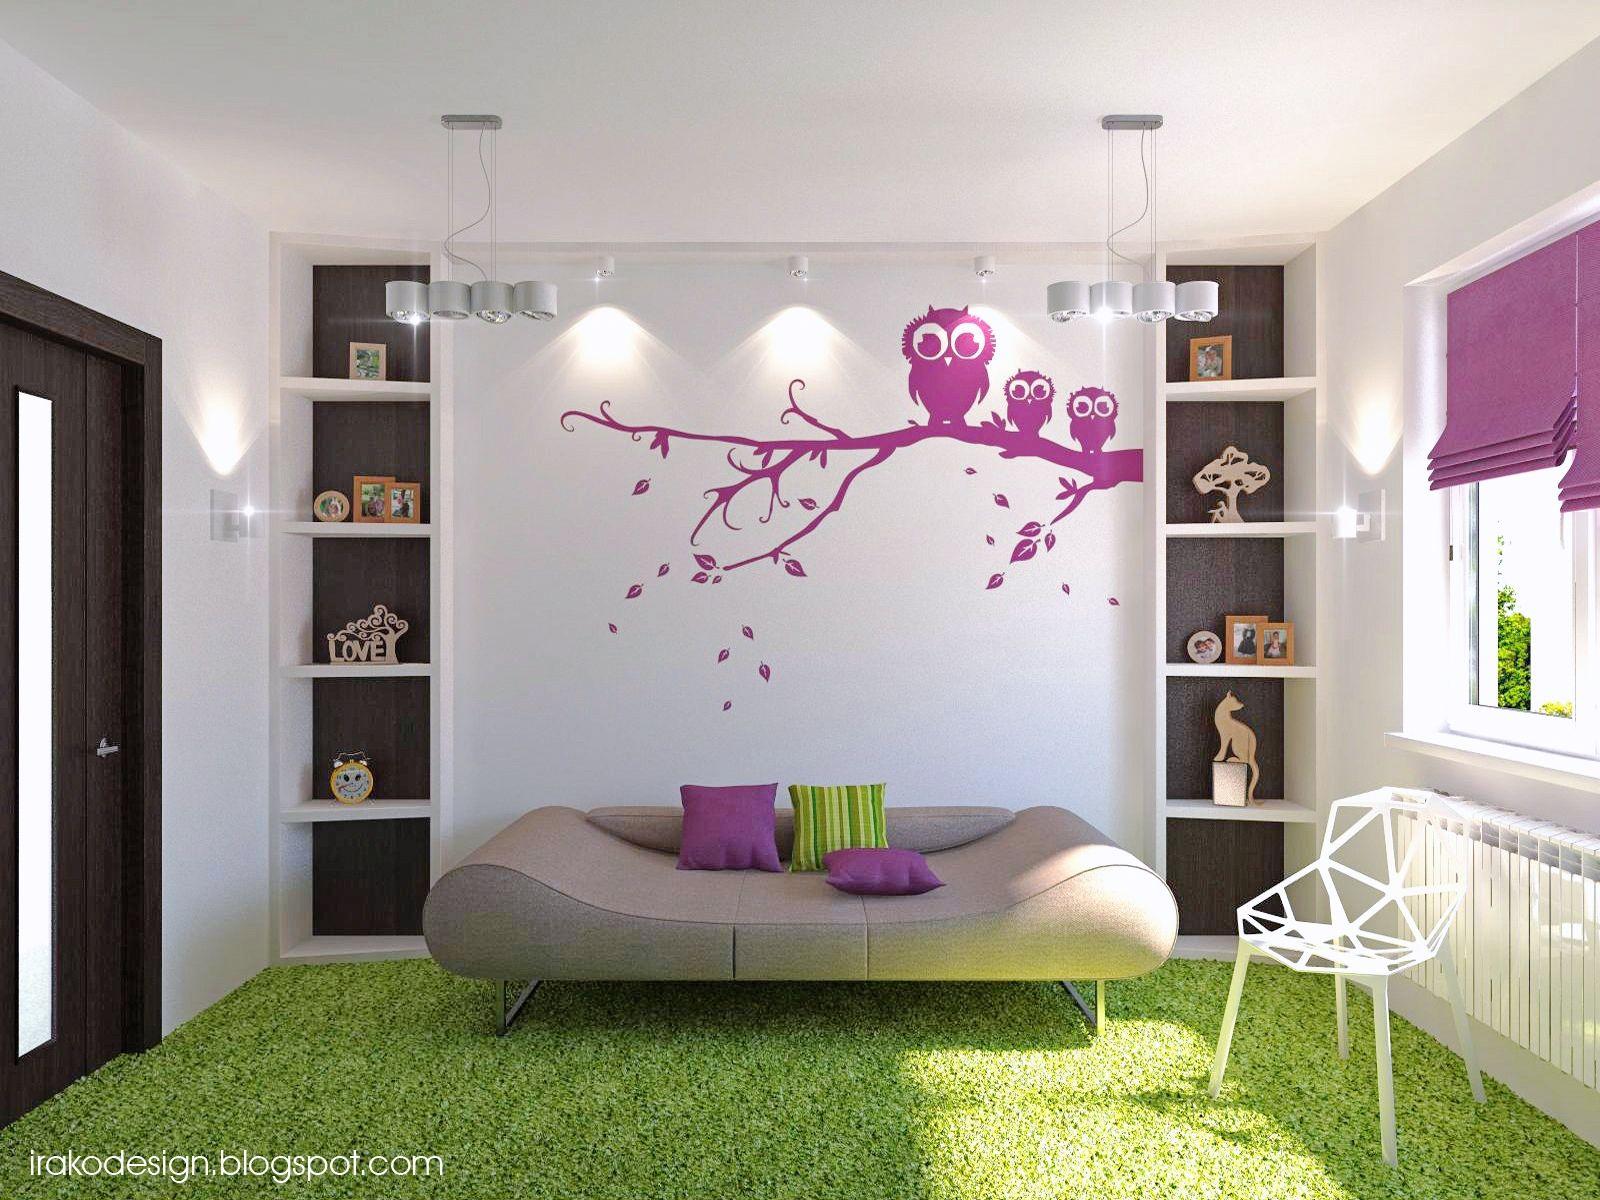 Cute Purple Bedroom Ideas Part - 42: Bedroom: Cute Purple Owl Wall Decals Green Carpet Minimalist Tween Girl Bedroom  Ideas Tween Bedrooms Ideas, Decorating Ideas For Tween Girls Bedroom ...